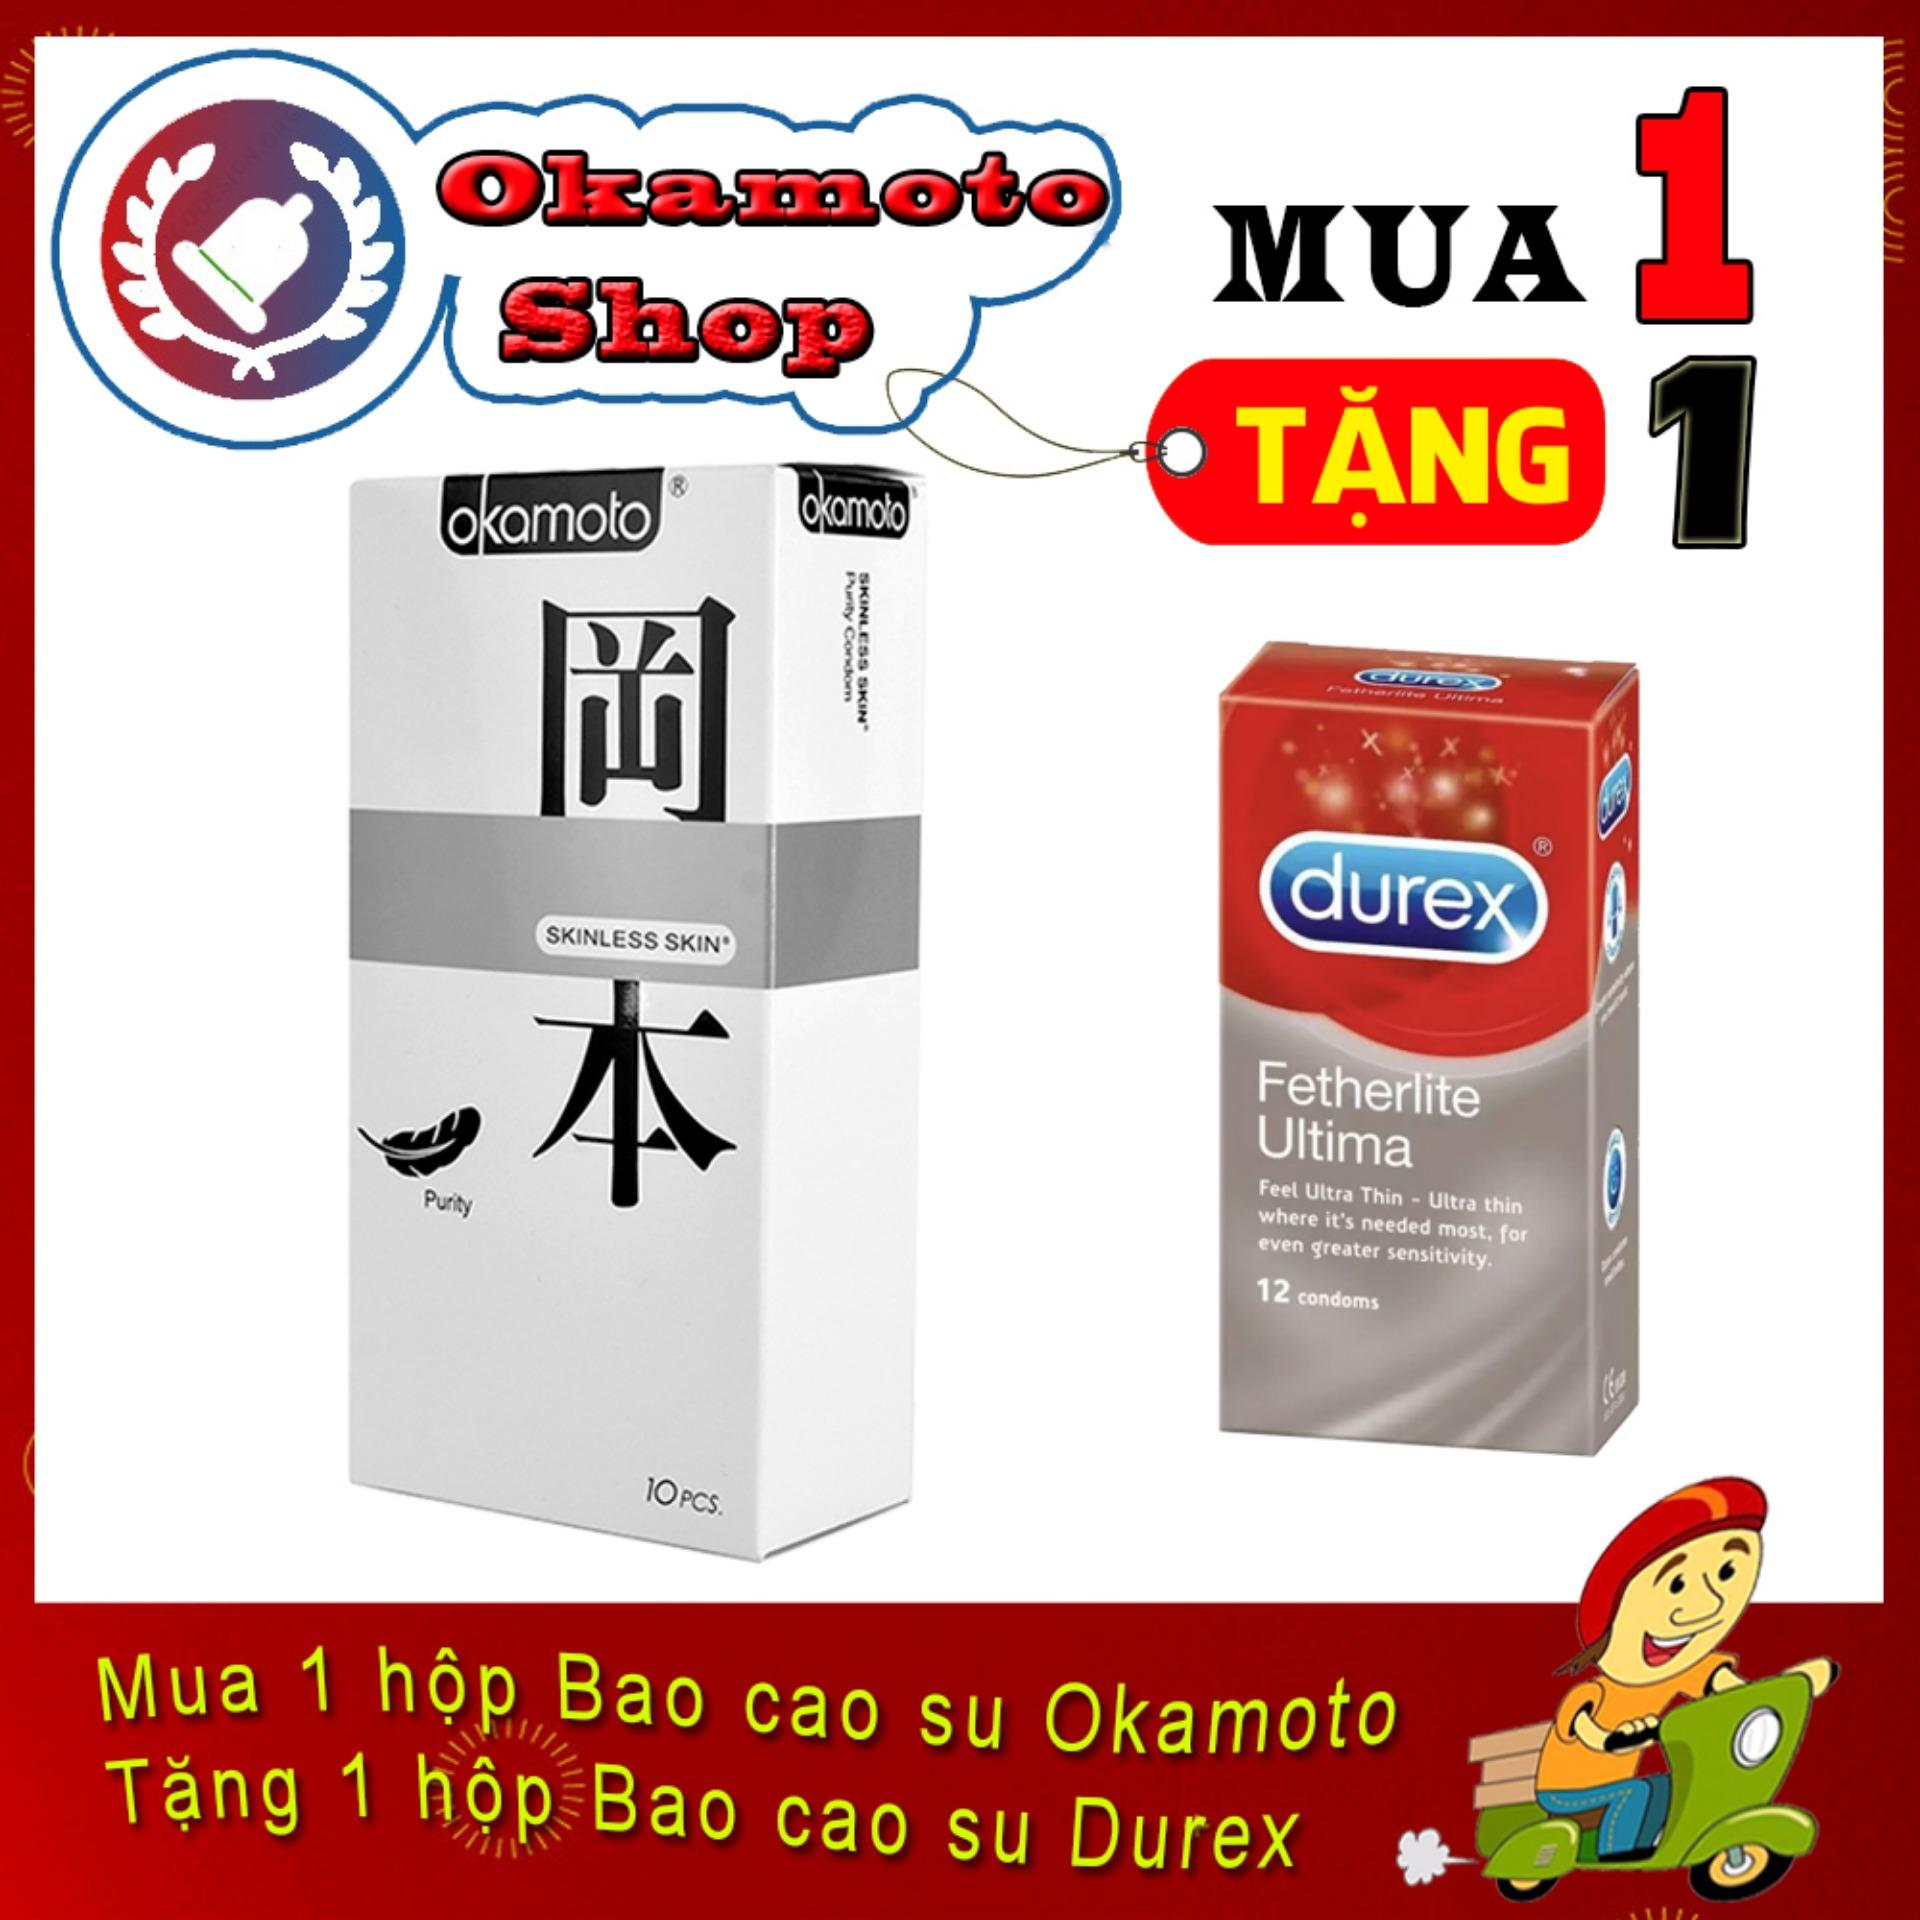 [Mua 1 tặng 1] Bao Cao Su Okamoto Purity siêu mỏng 0.05mm 10s - Tặng Bao cao su Durex Ultima siêu mỏng 12s